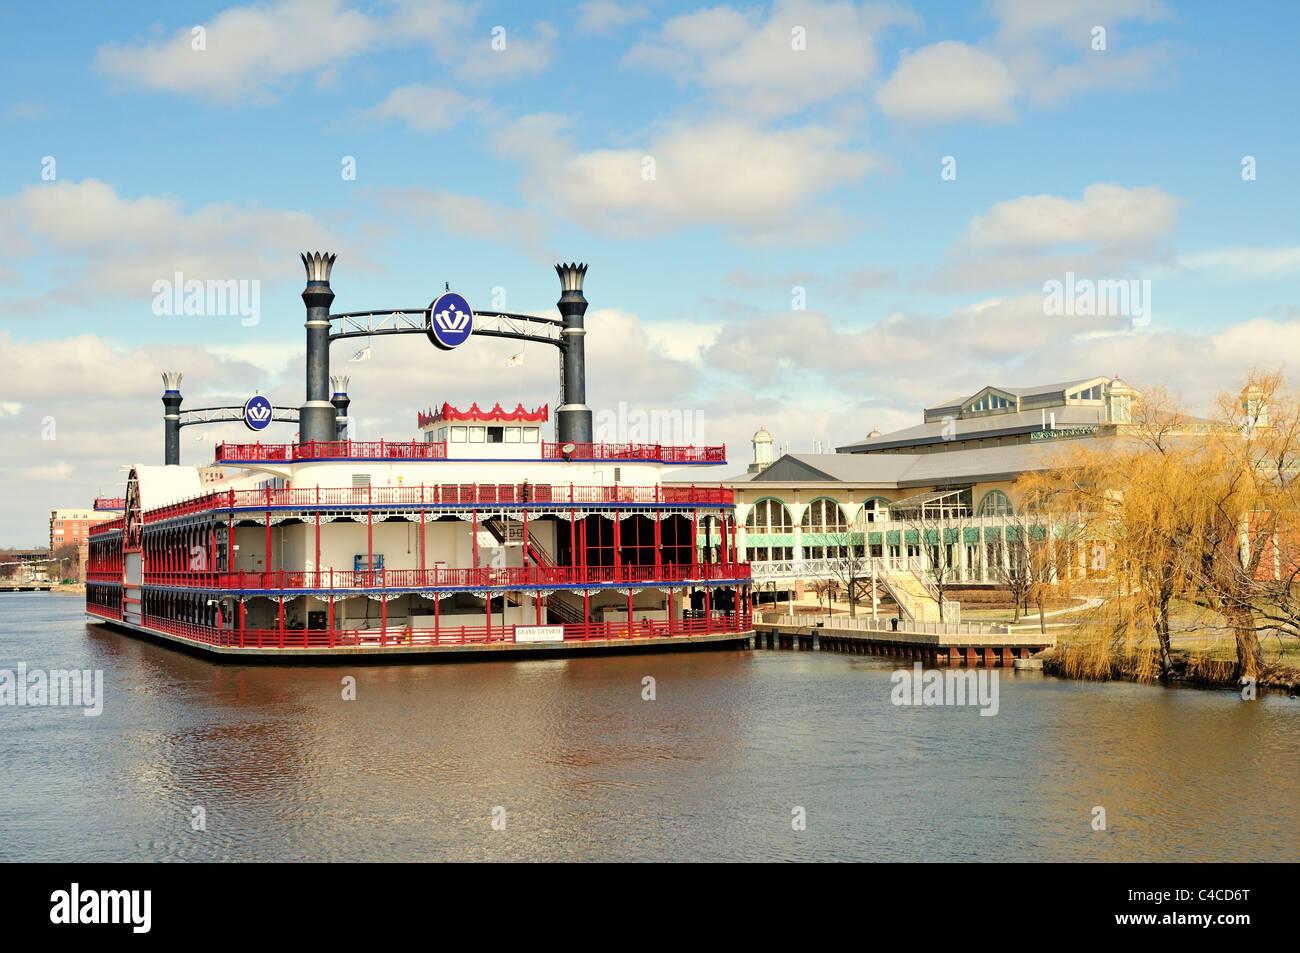 Elgin river boat casino hardie smith casino maimi